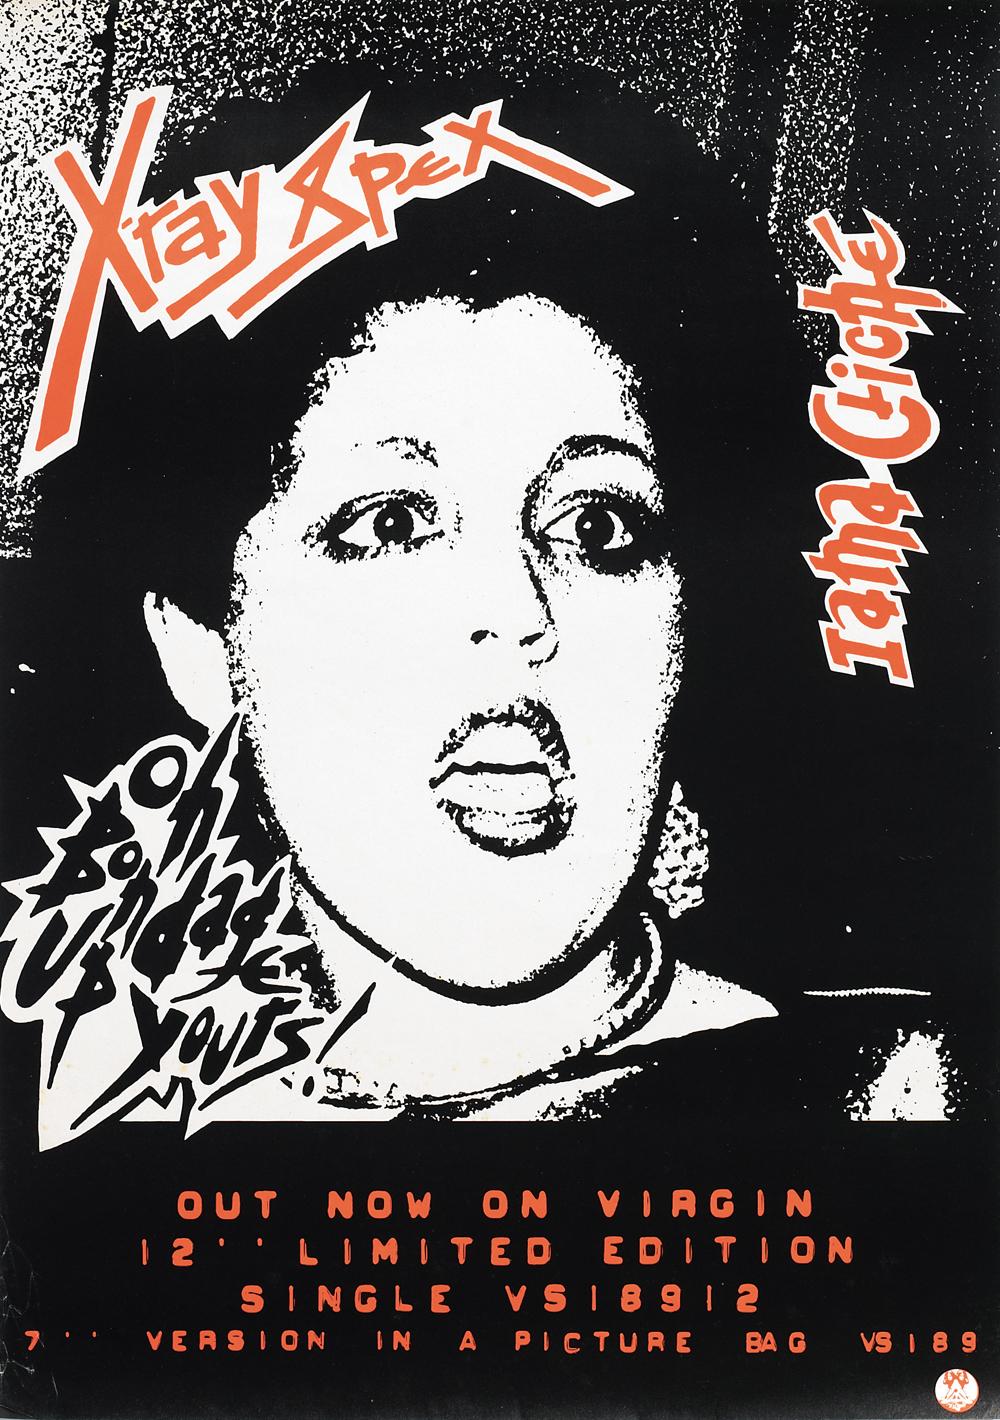 241X Ray Spex poster.jpg